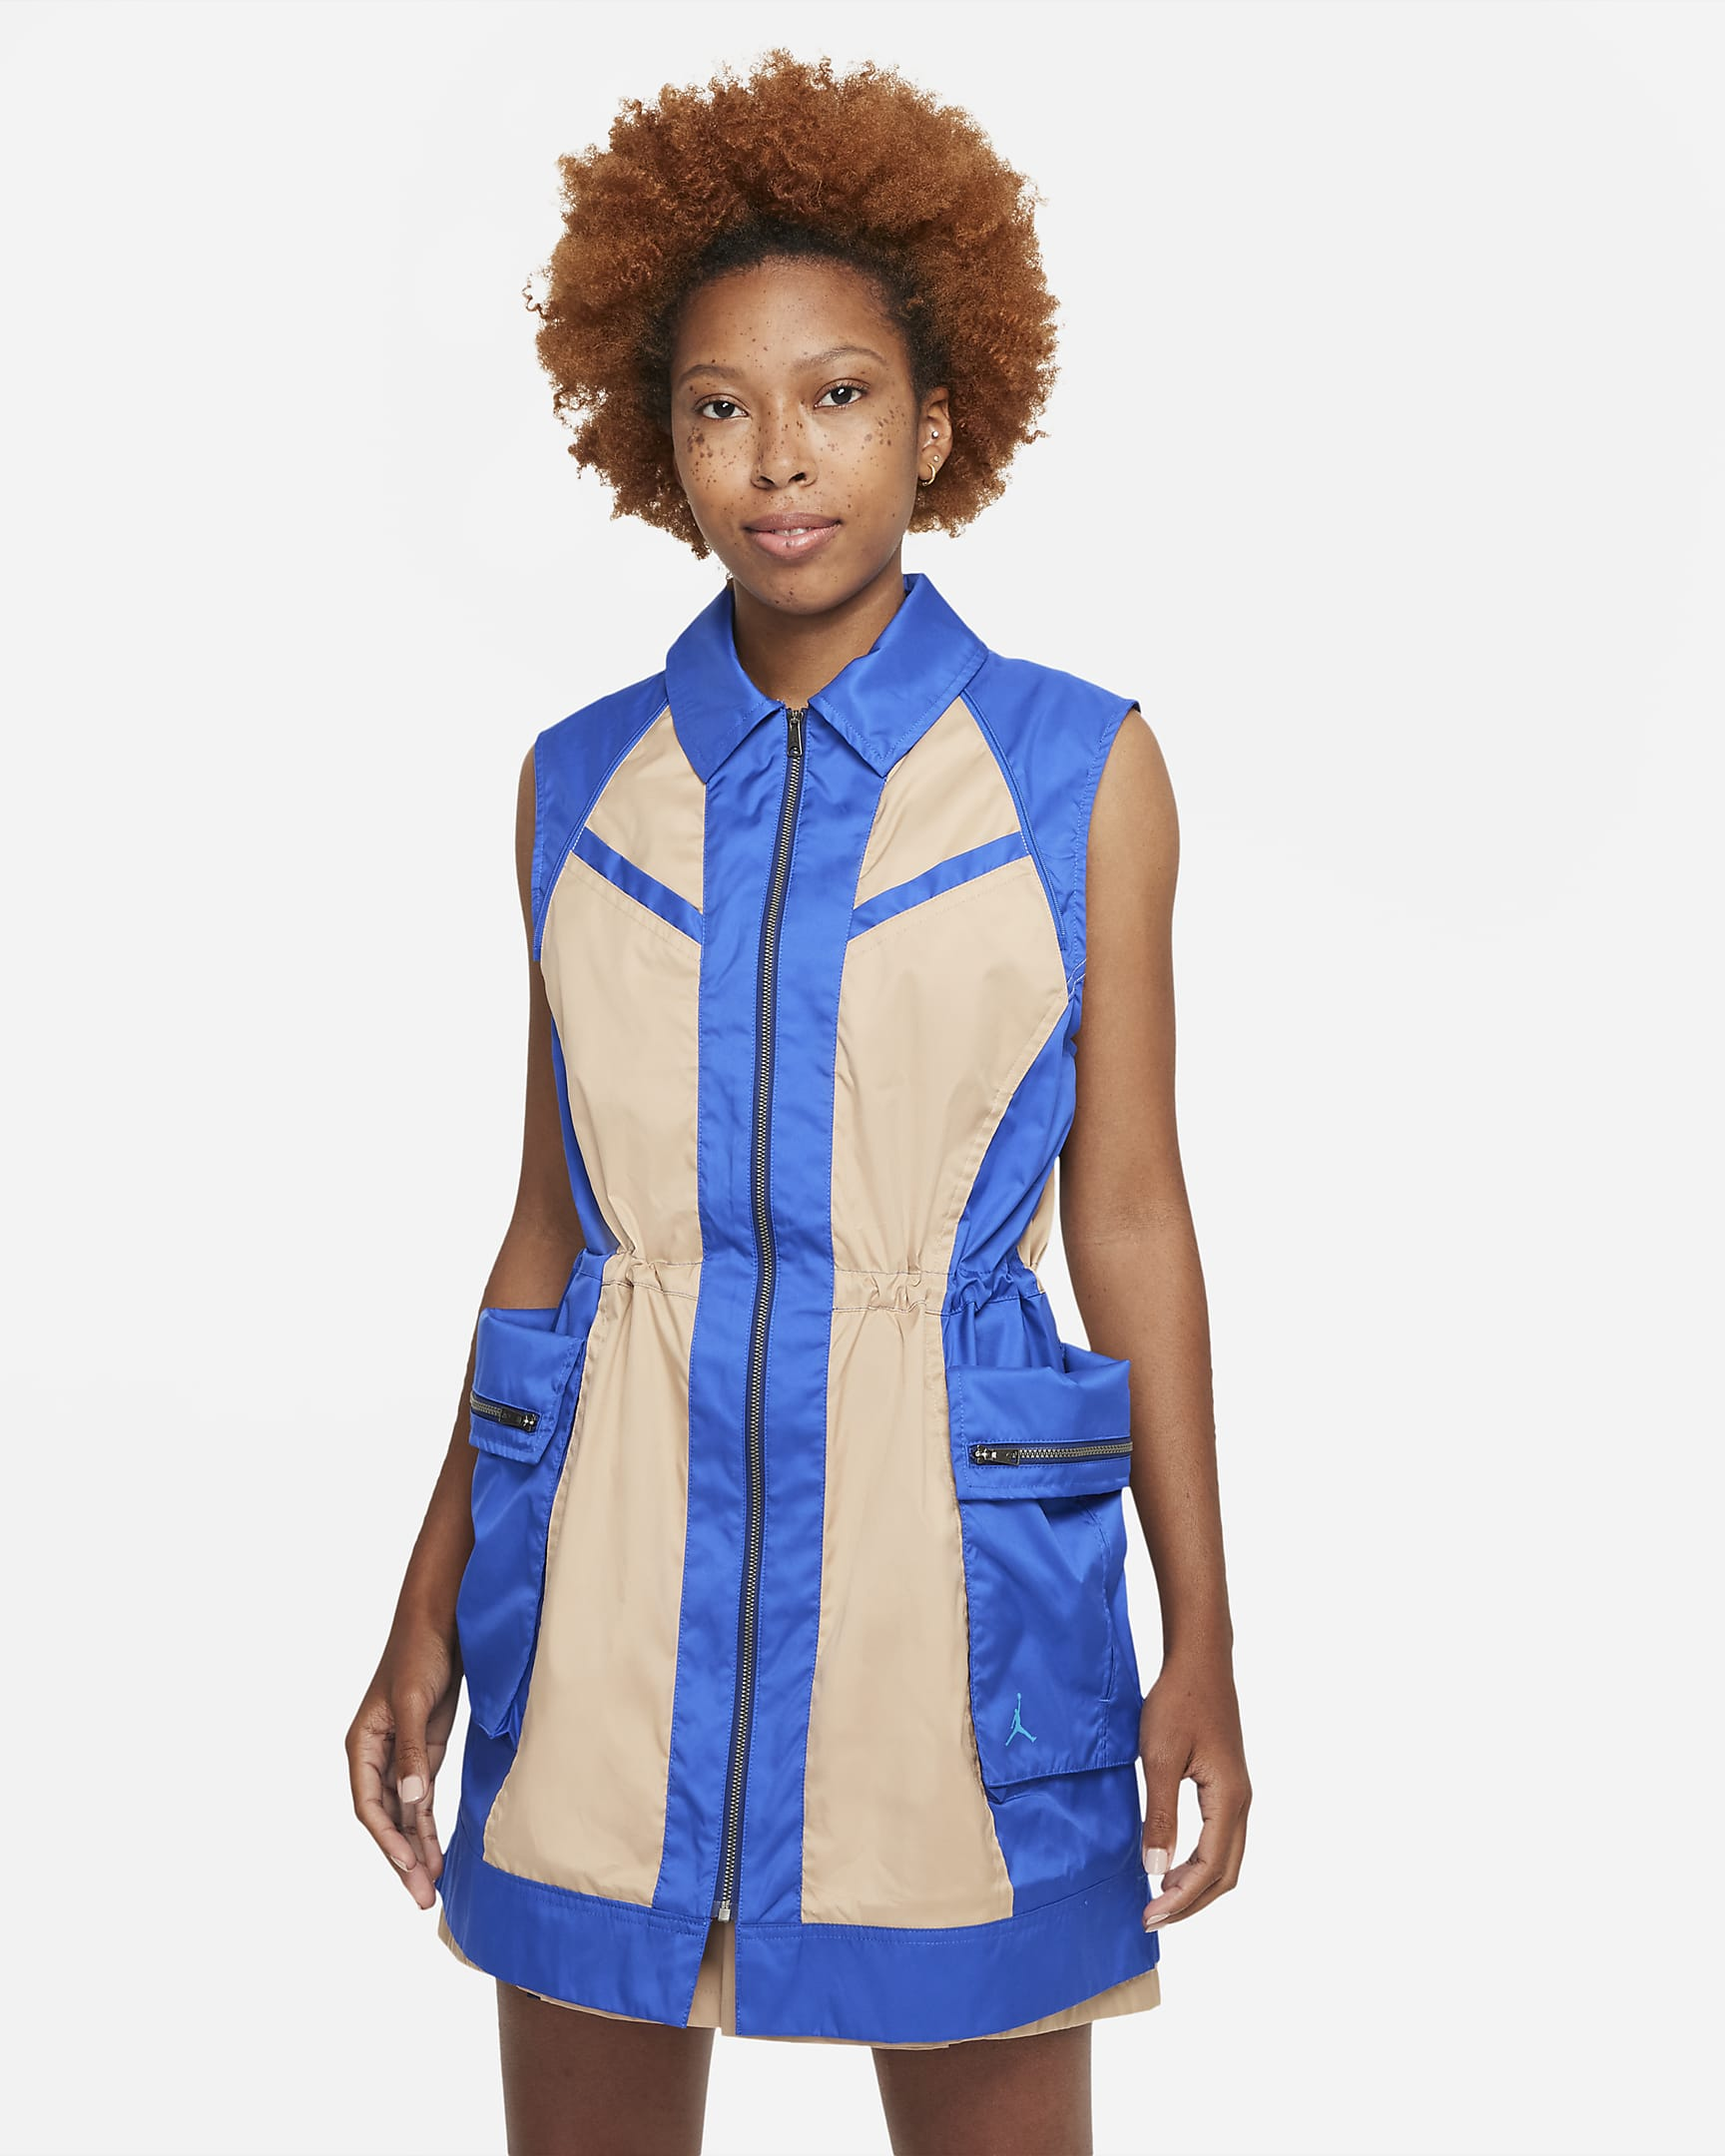 jordan-next-utility-capsule-womens-jacket-rhM8Kn-2.png